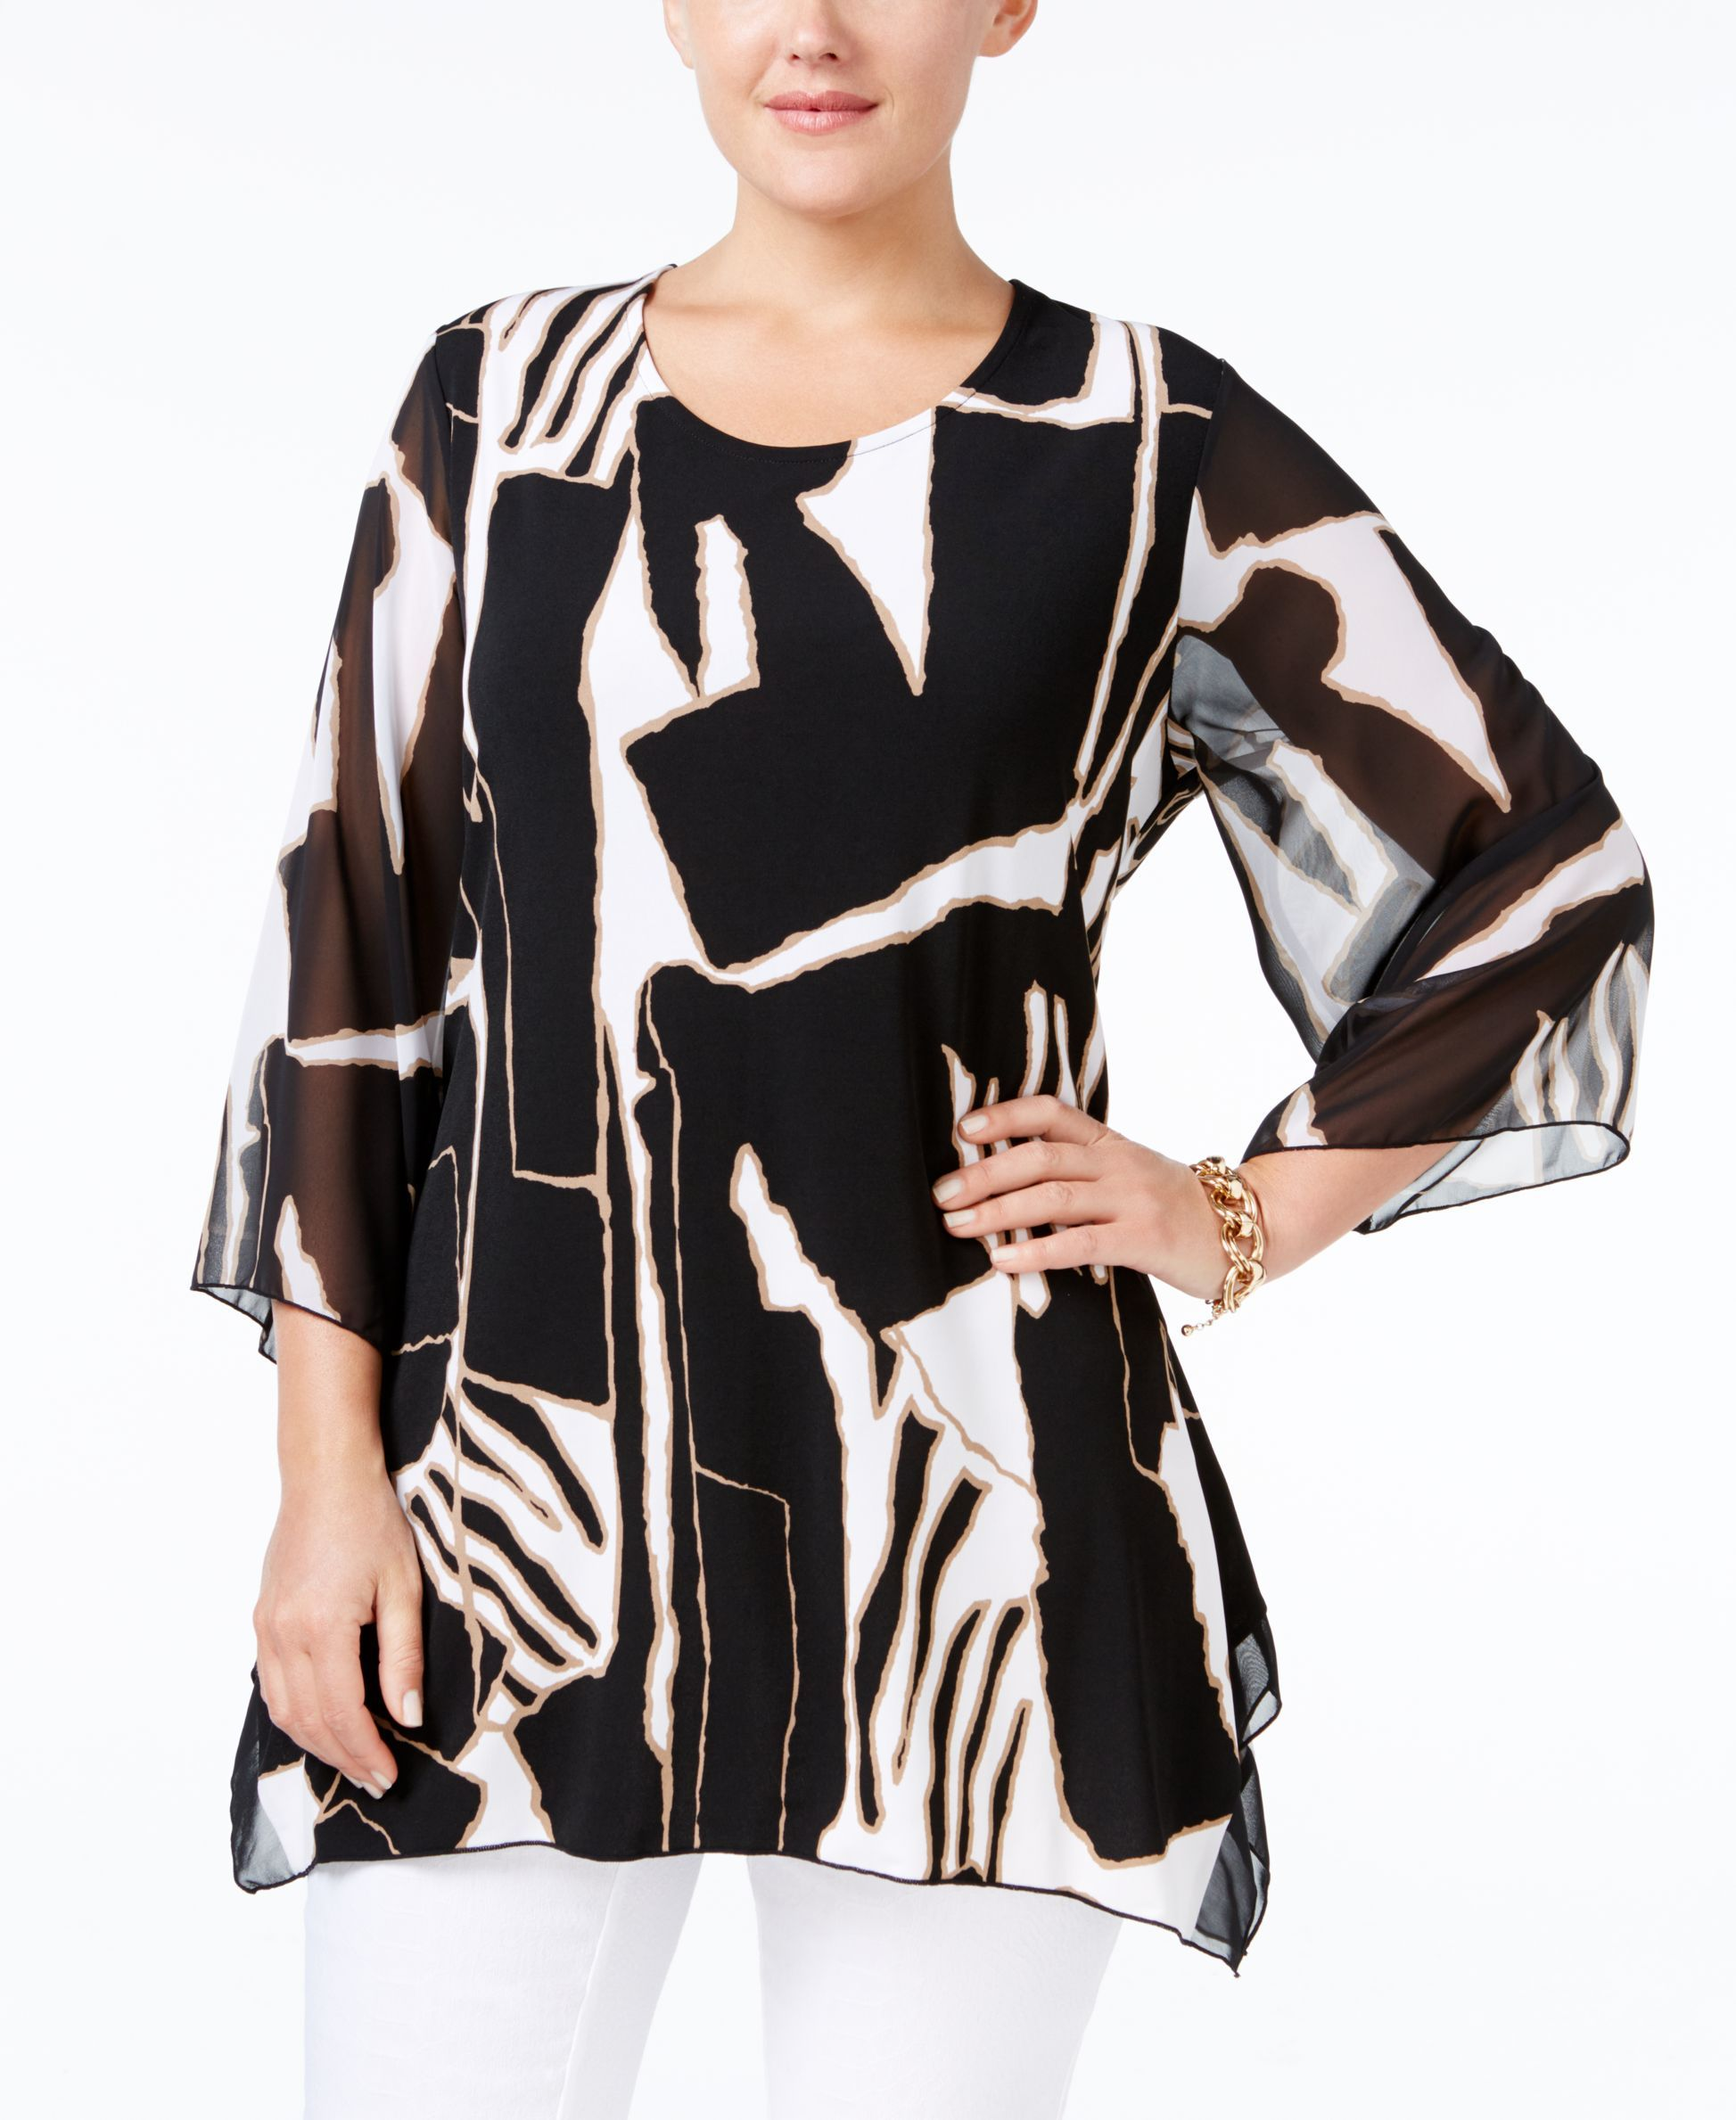 JM Collection Plus Size Studded Handkerchief-Hem Top, Only at Macys - Tops - Plus Sizes - Macy